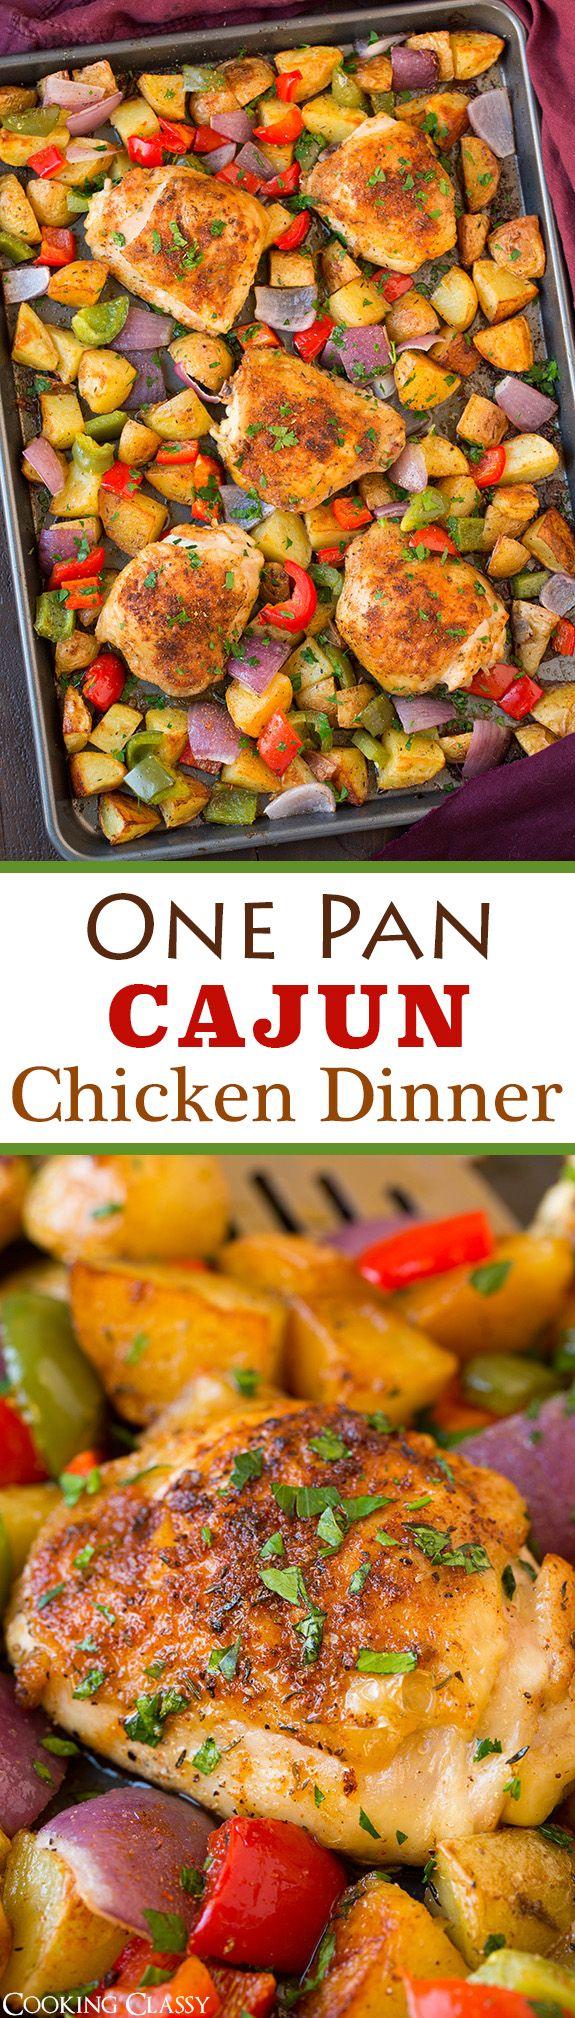 One Pan Cajun Chicken and Veggies - Cooking Classy